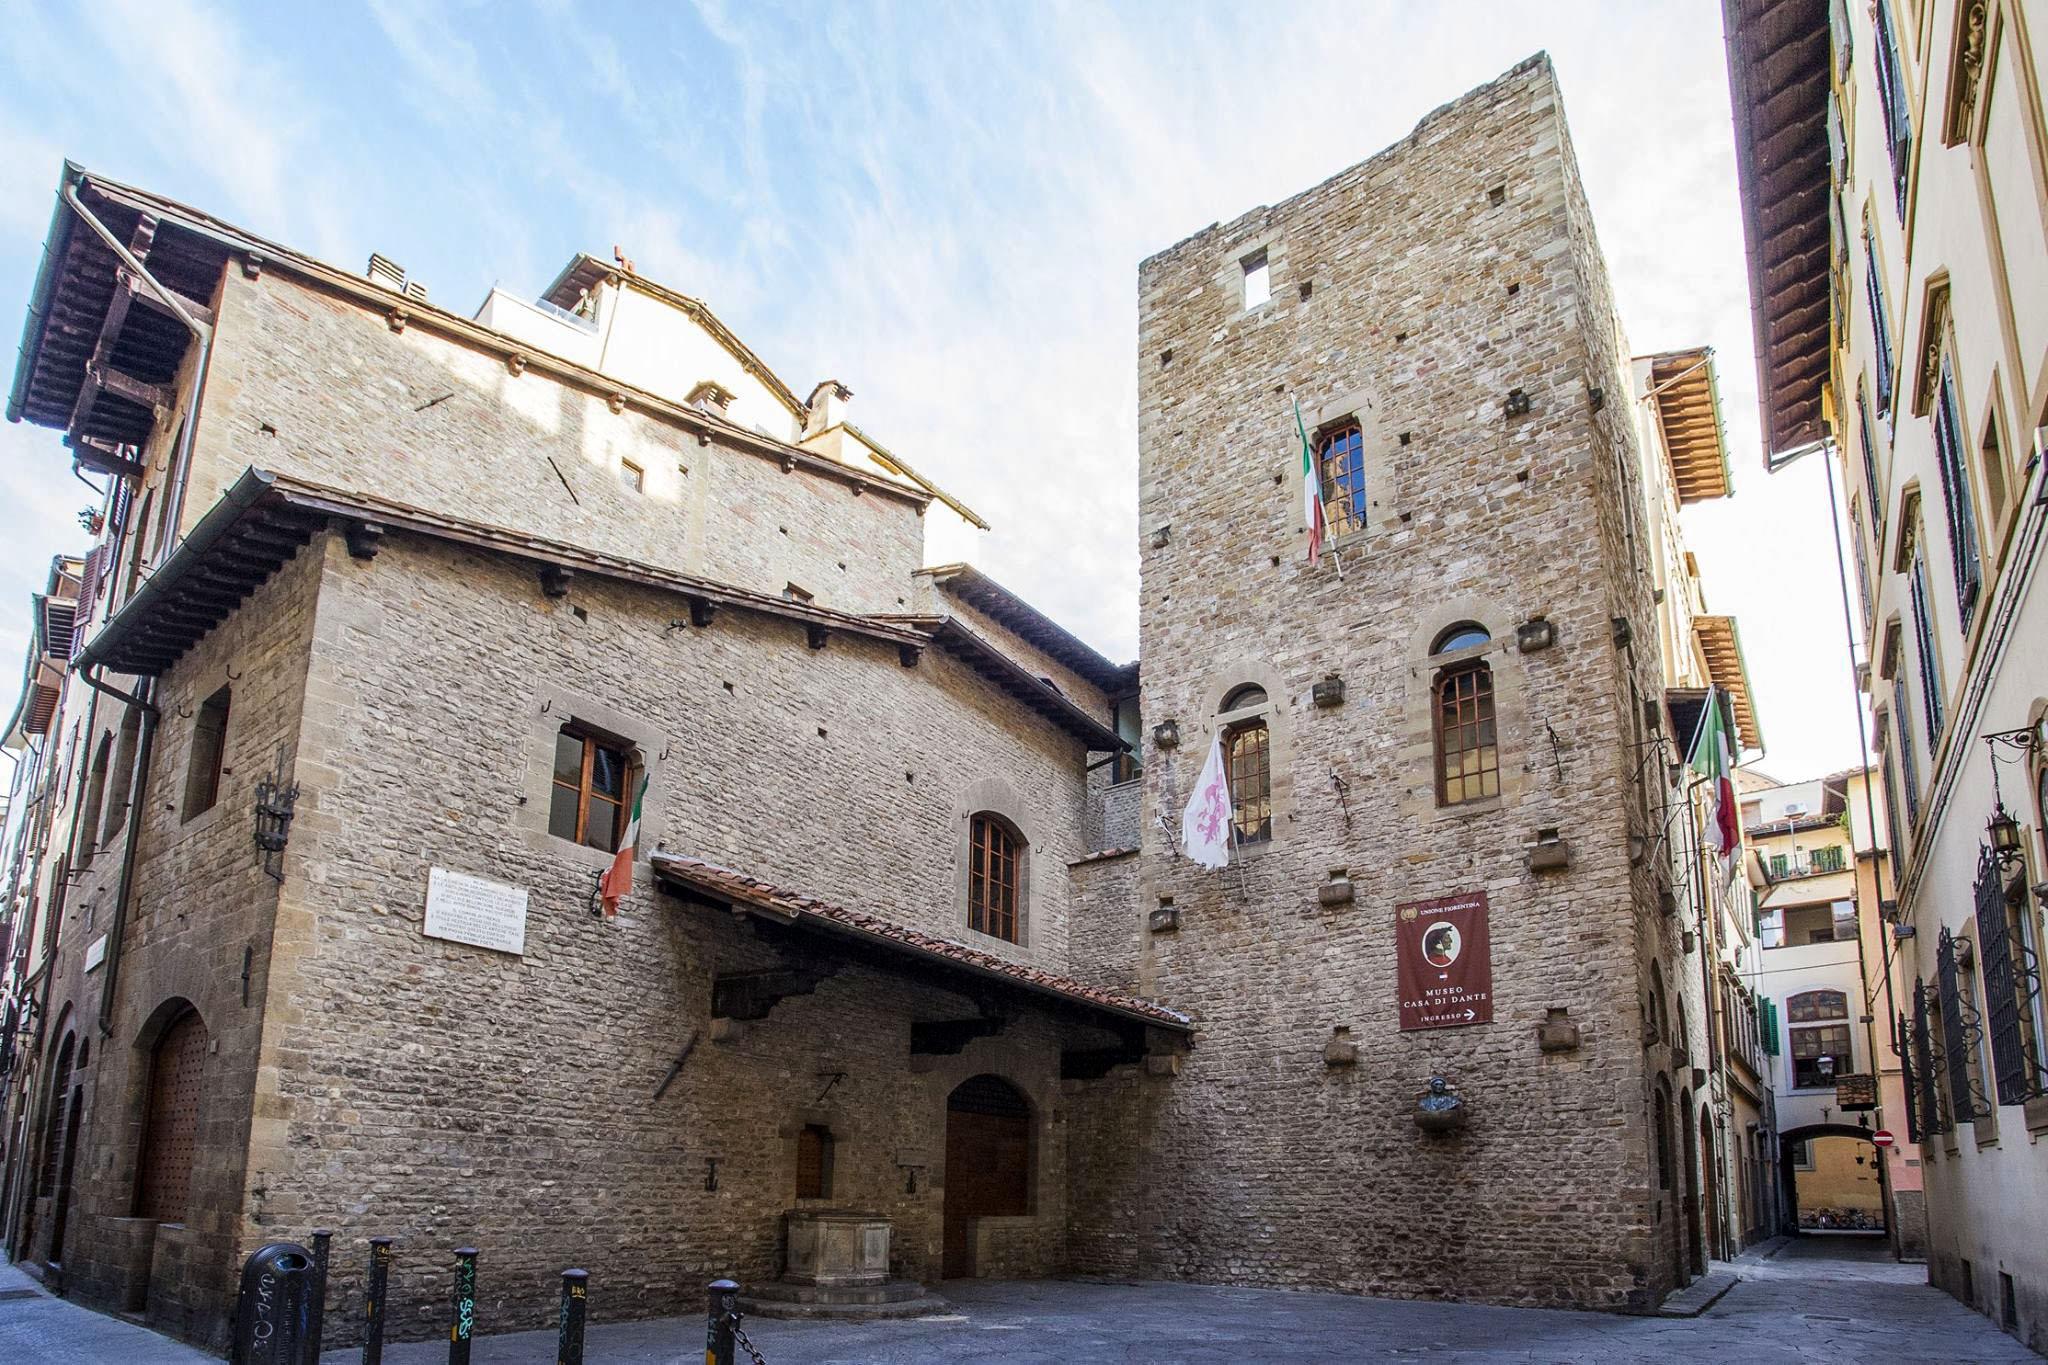 Museo Casa di Dante, Dantes House Museum, Casa Museo de Dante, Museum Dante Haus, Musee Maison de Dante